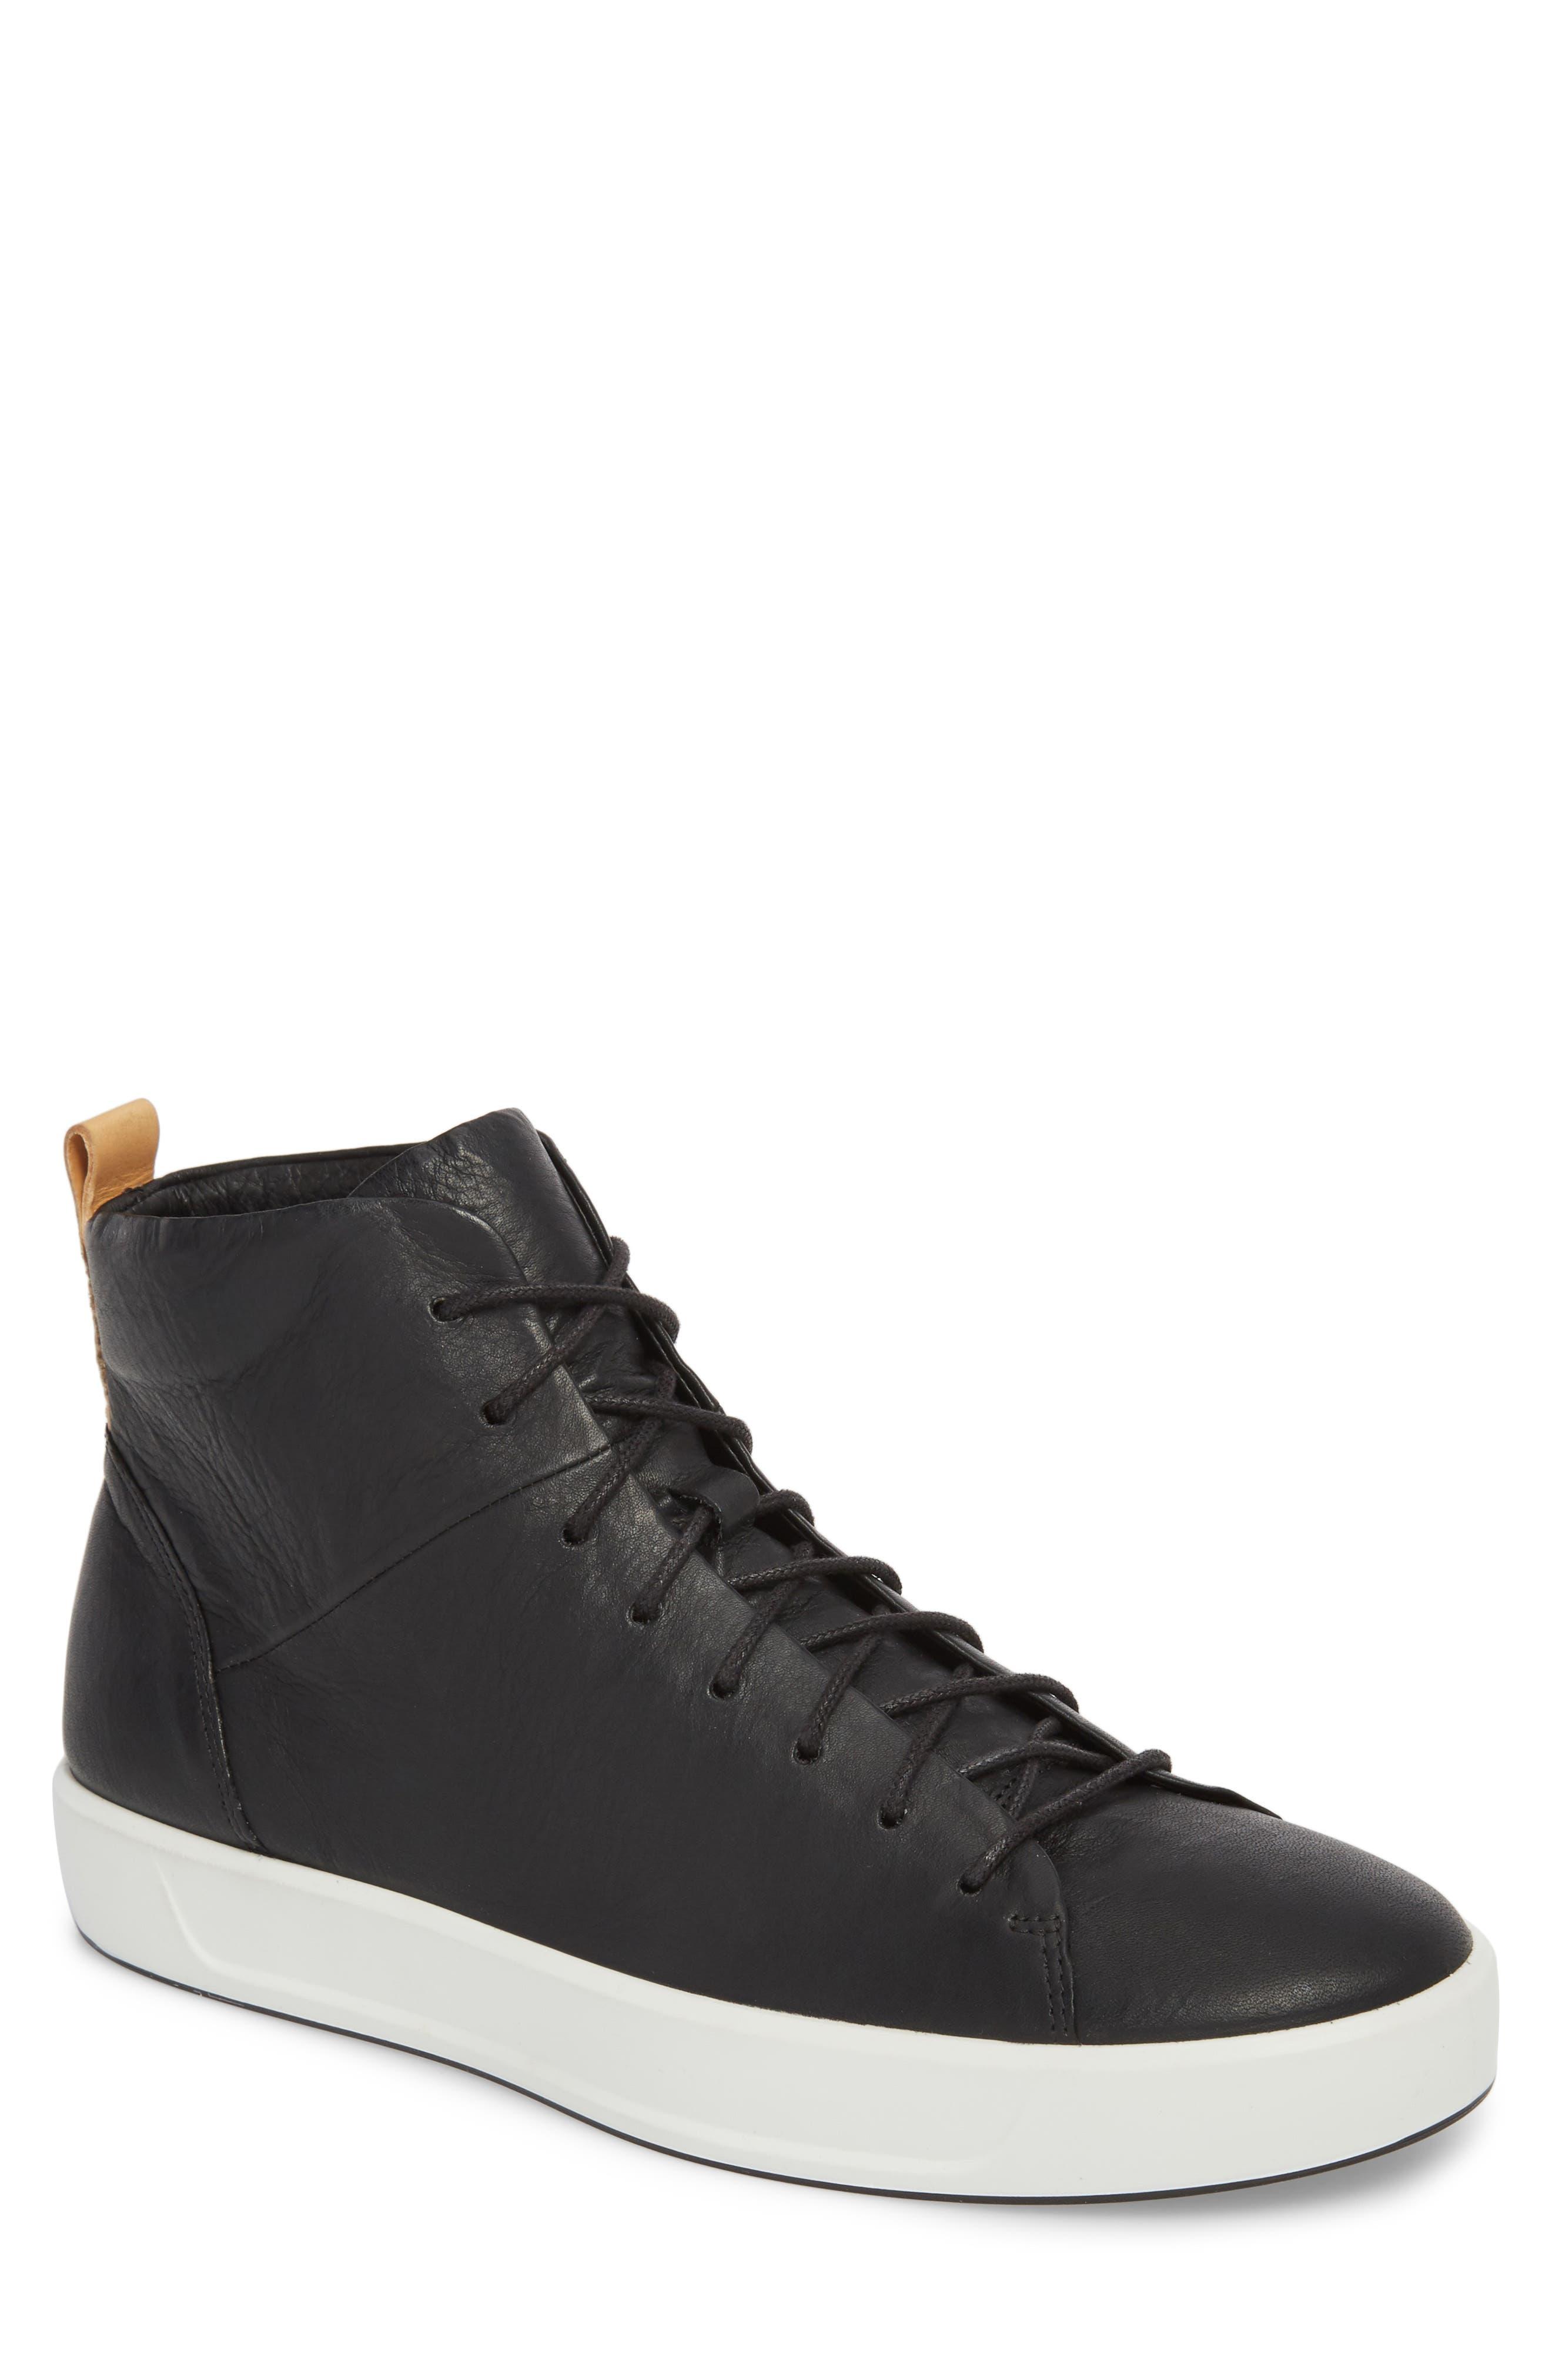 Soft 8 Sneaker,                         Main,                         color,